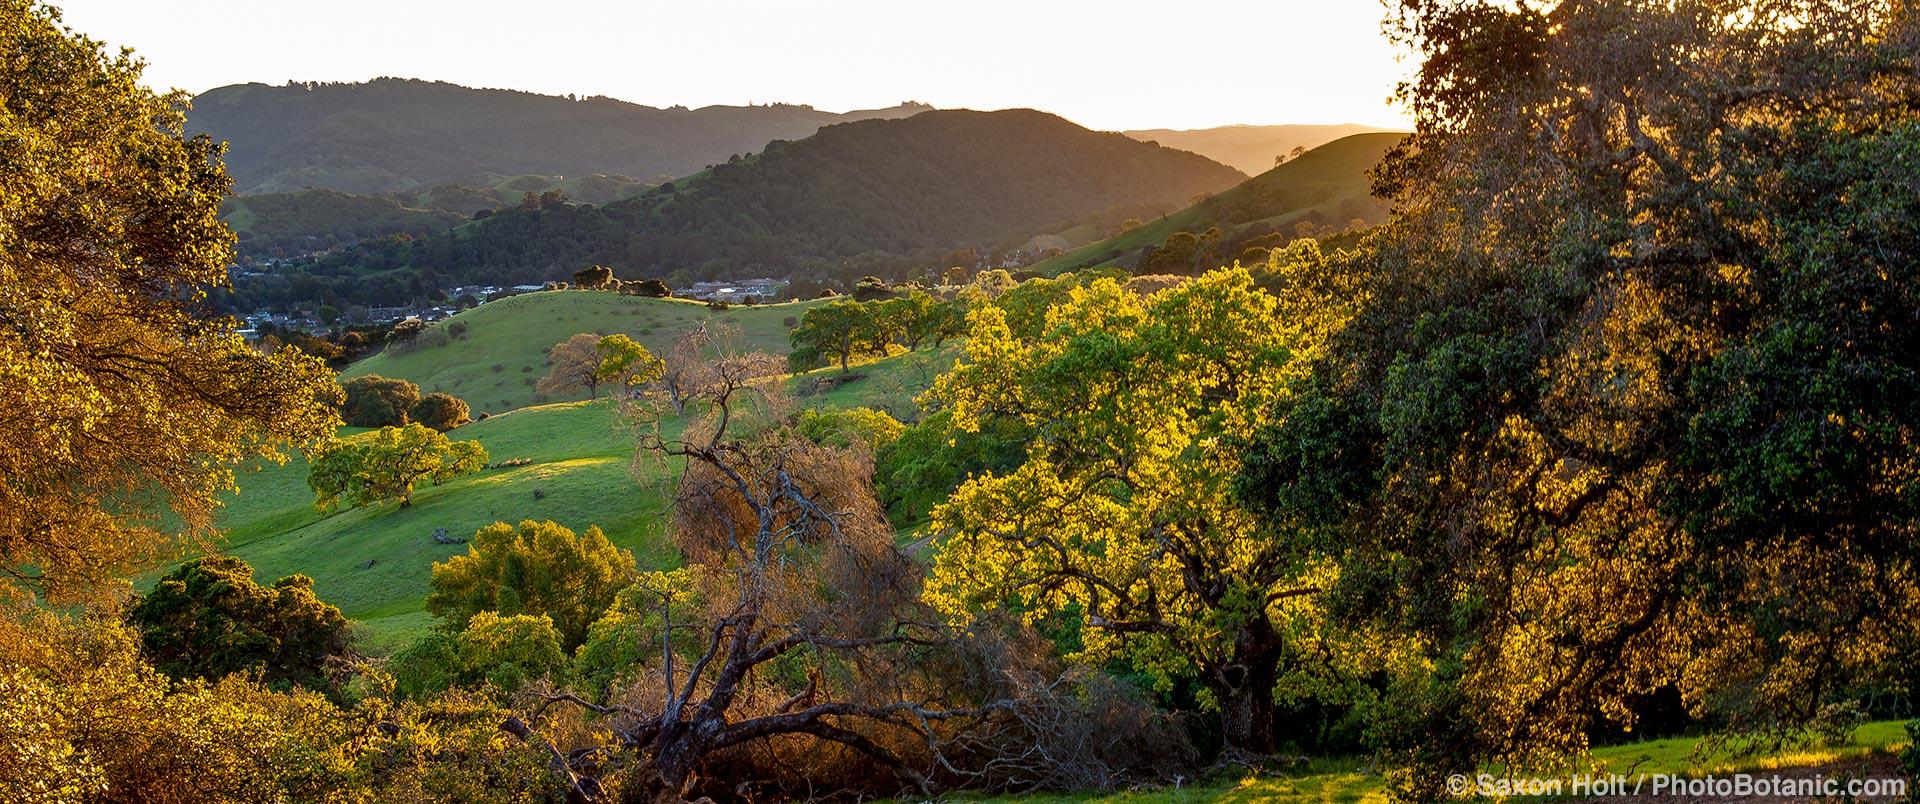 California Coastal Range with Oak trees (Quercus lobata) and rolling hills on Mt. Burdell State Park, Novato, California